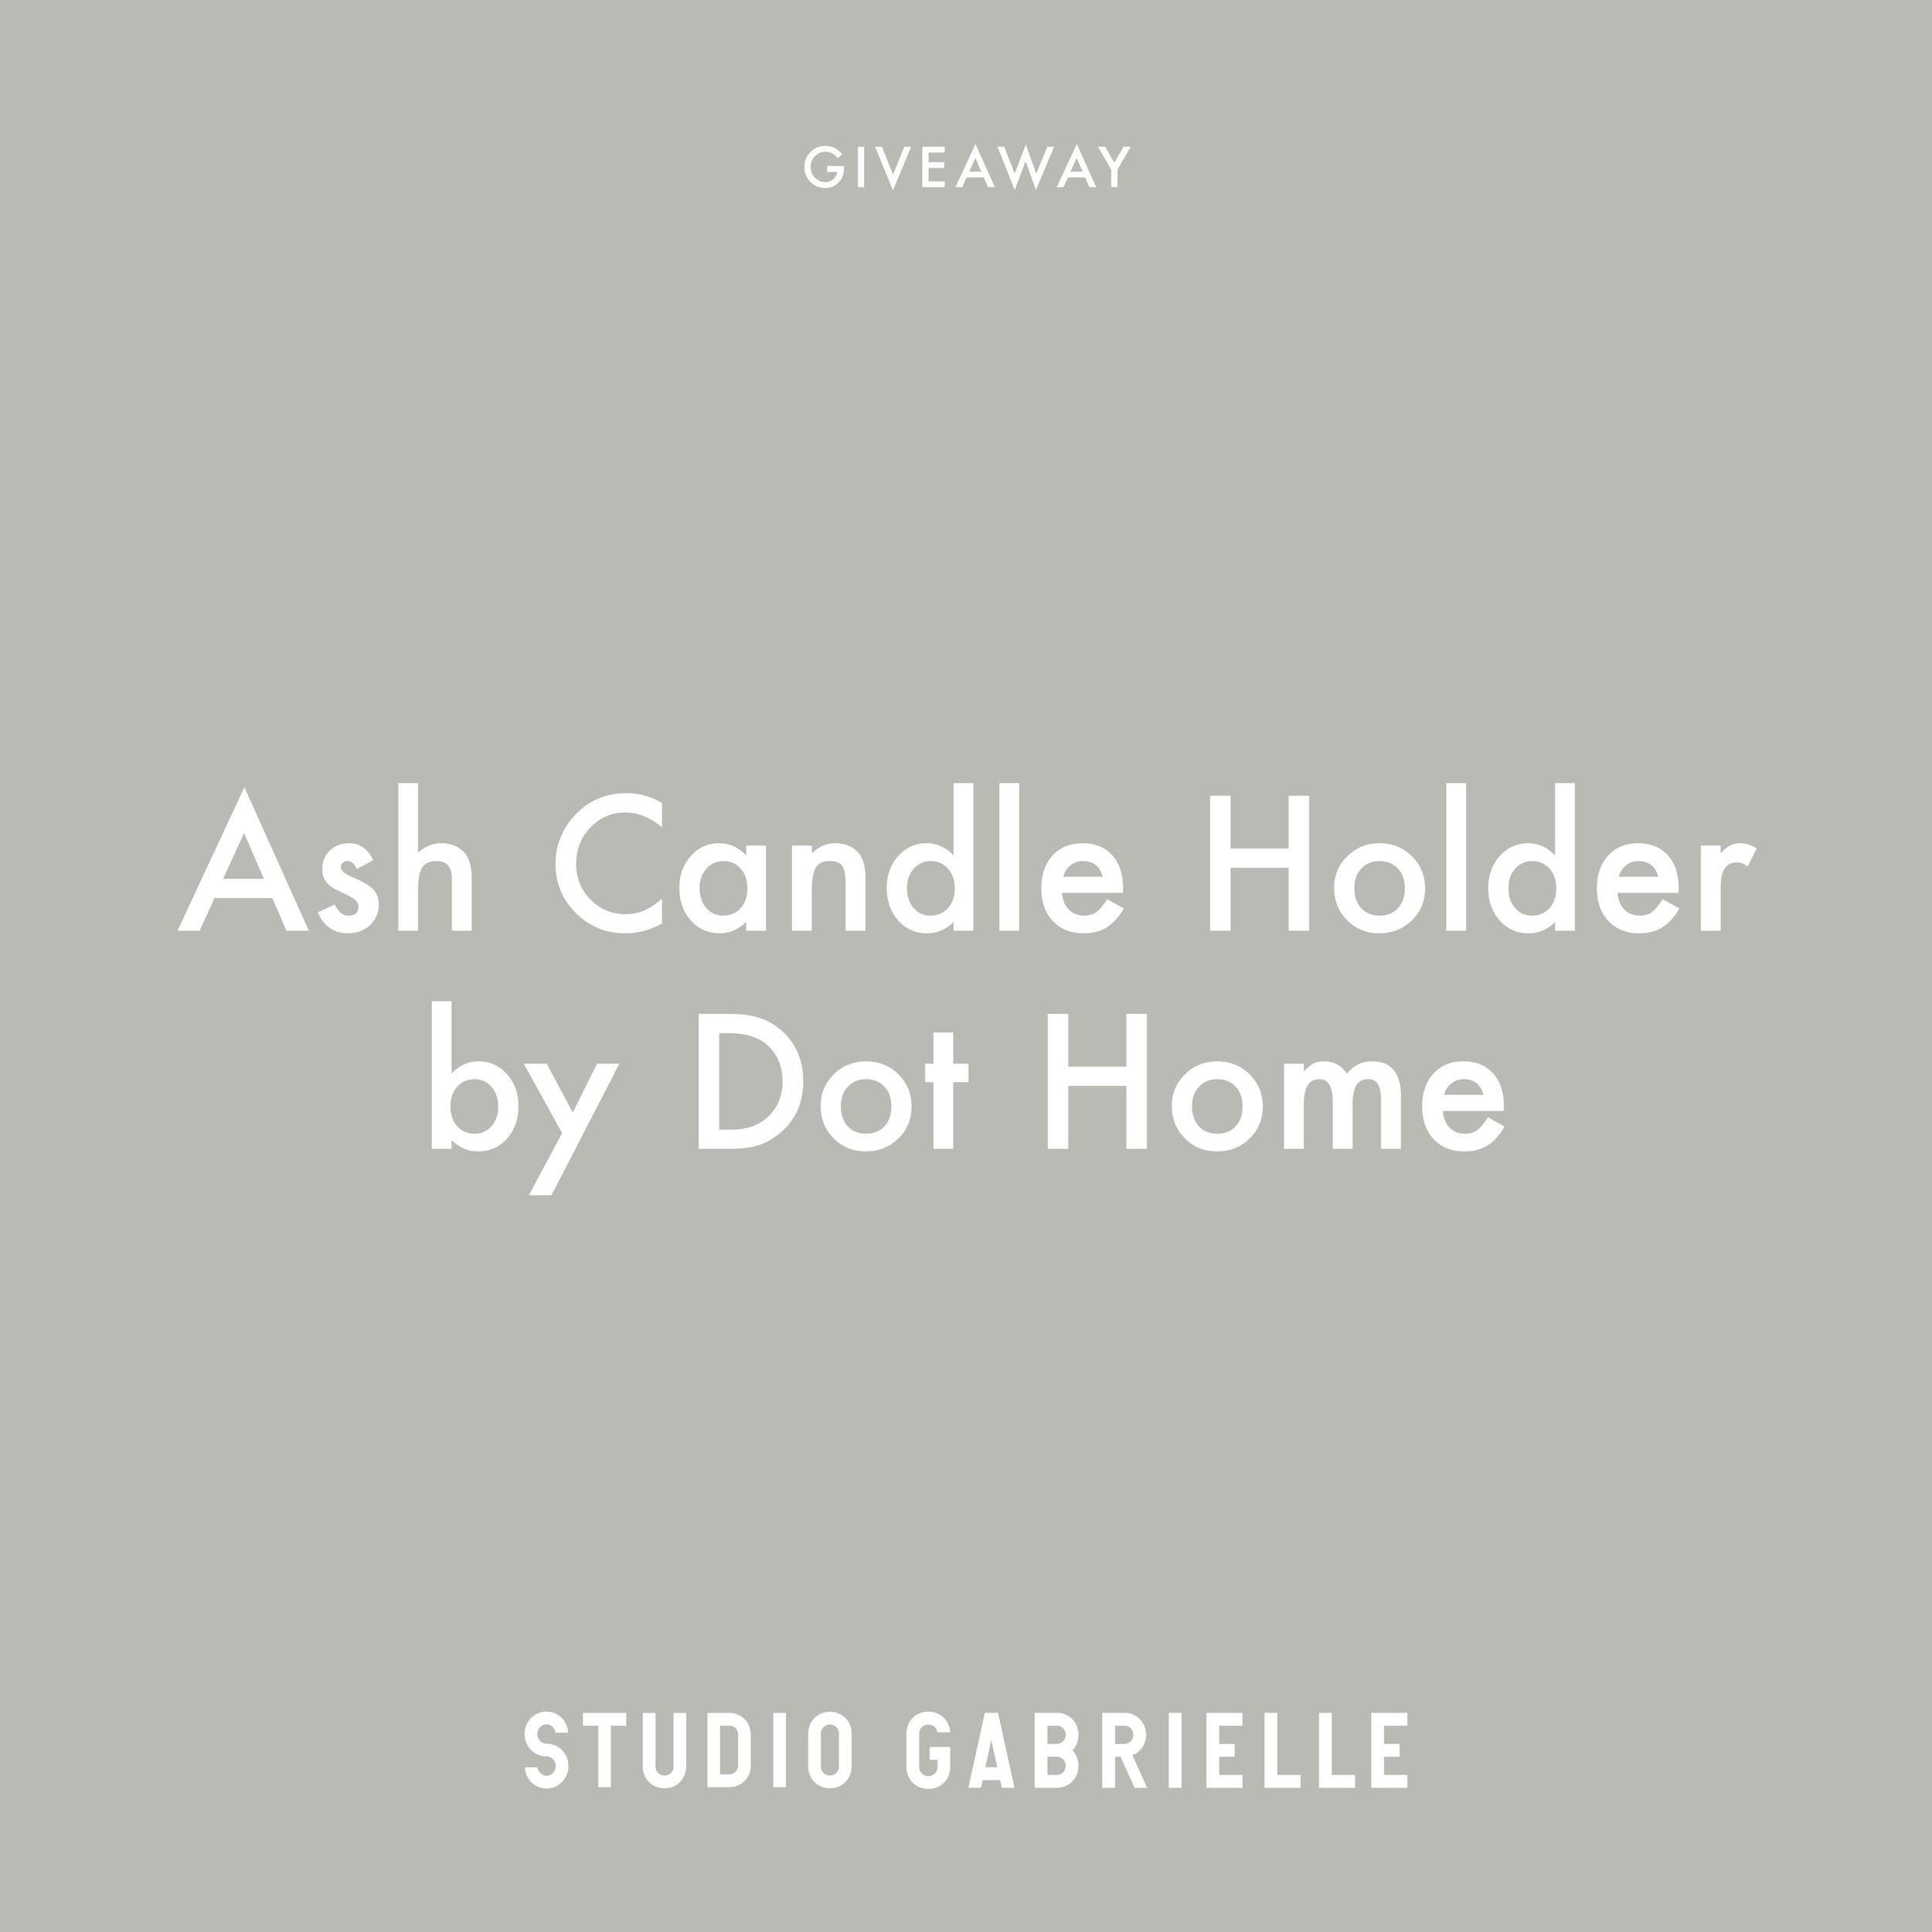 StudioGabrielle_Giveaway_Ash_CandleHolder_DotHome